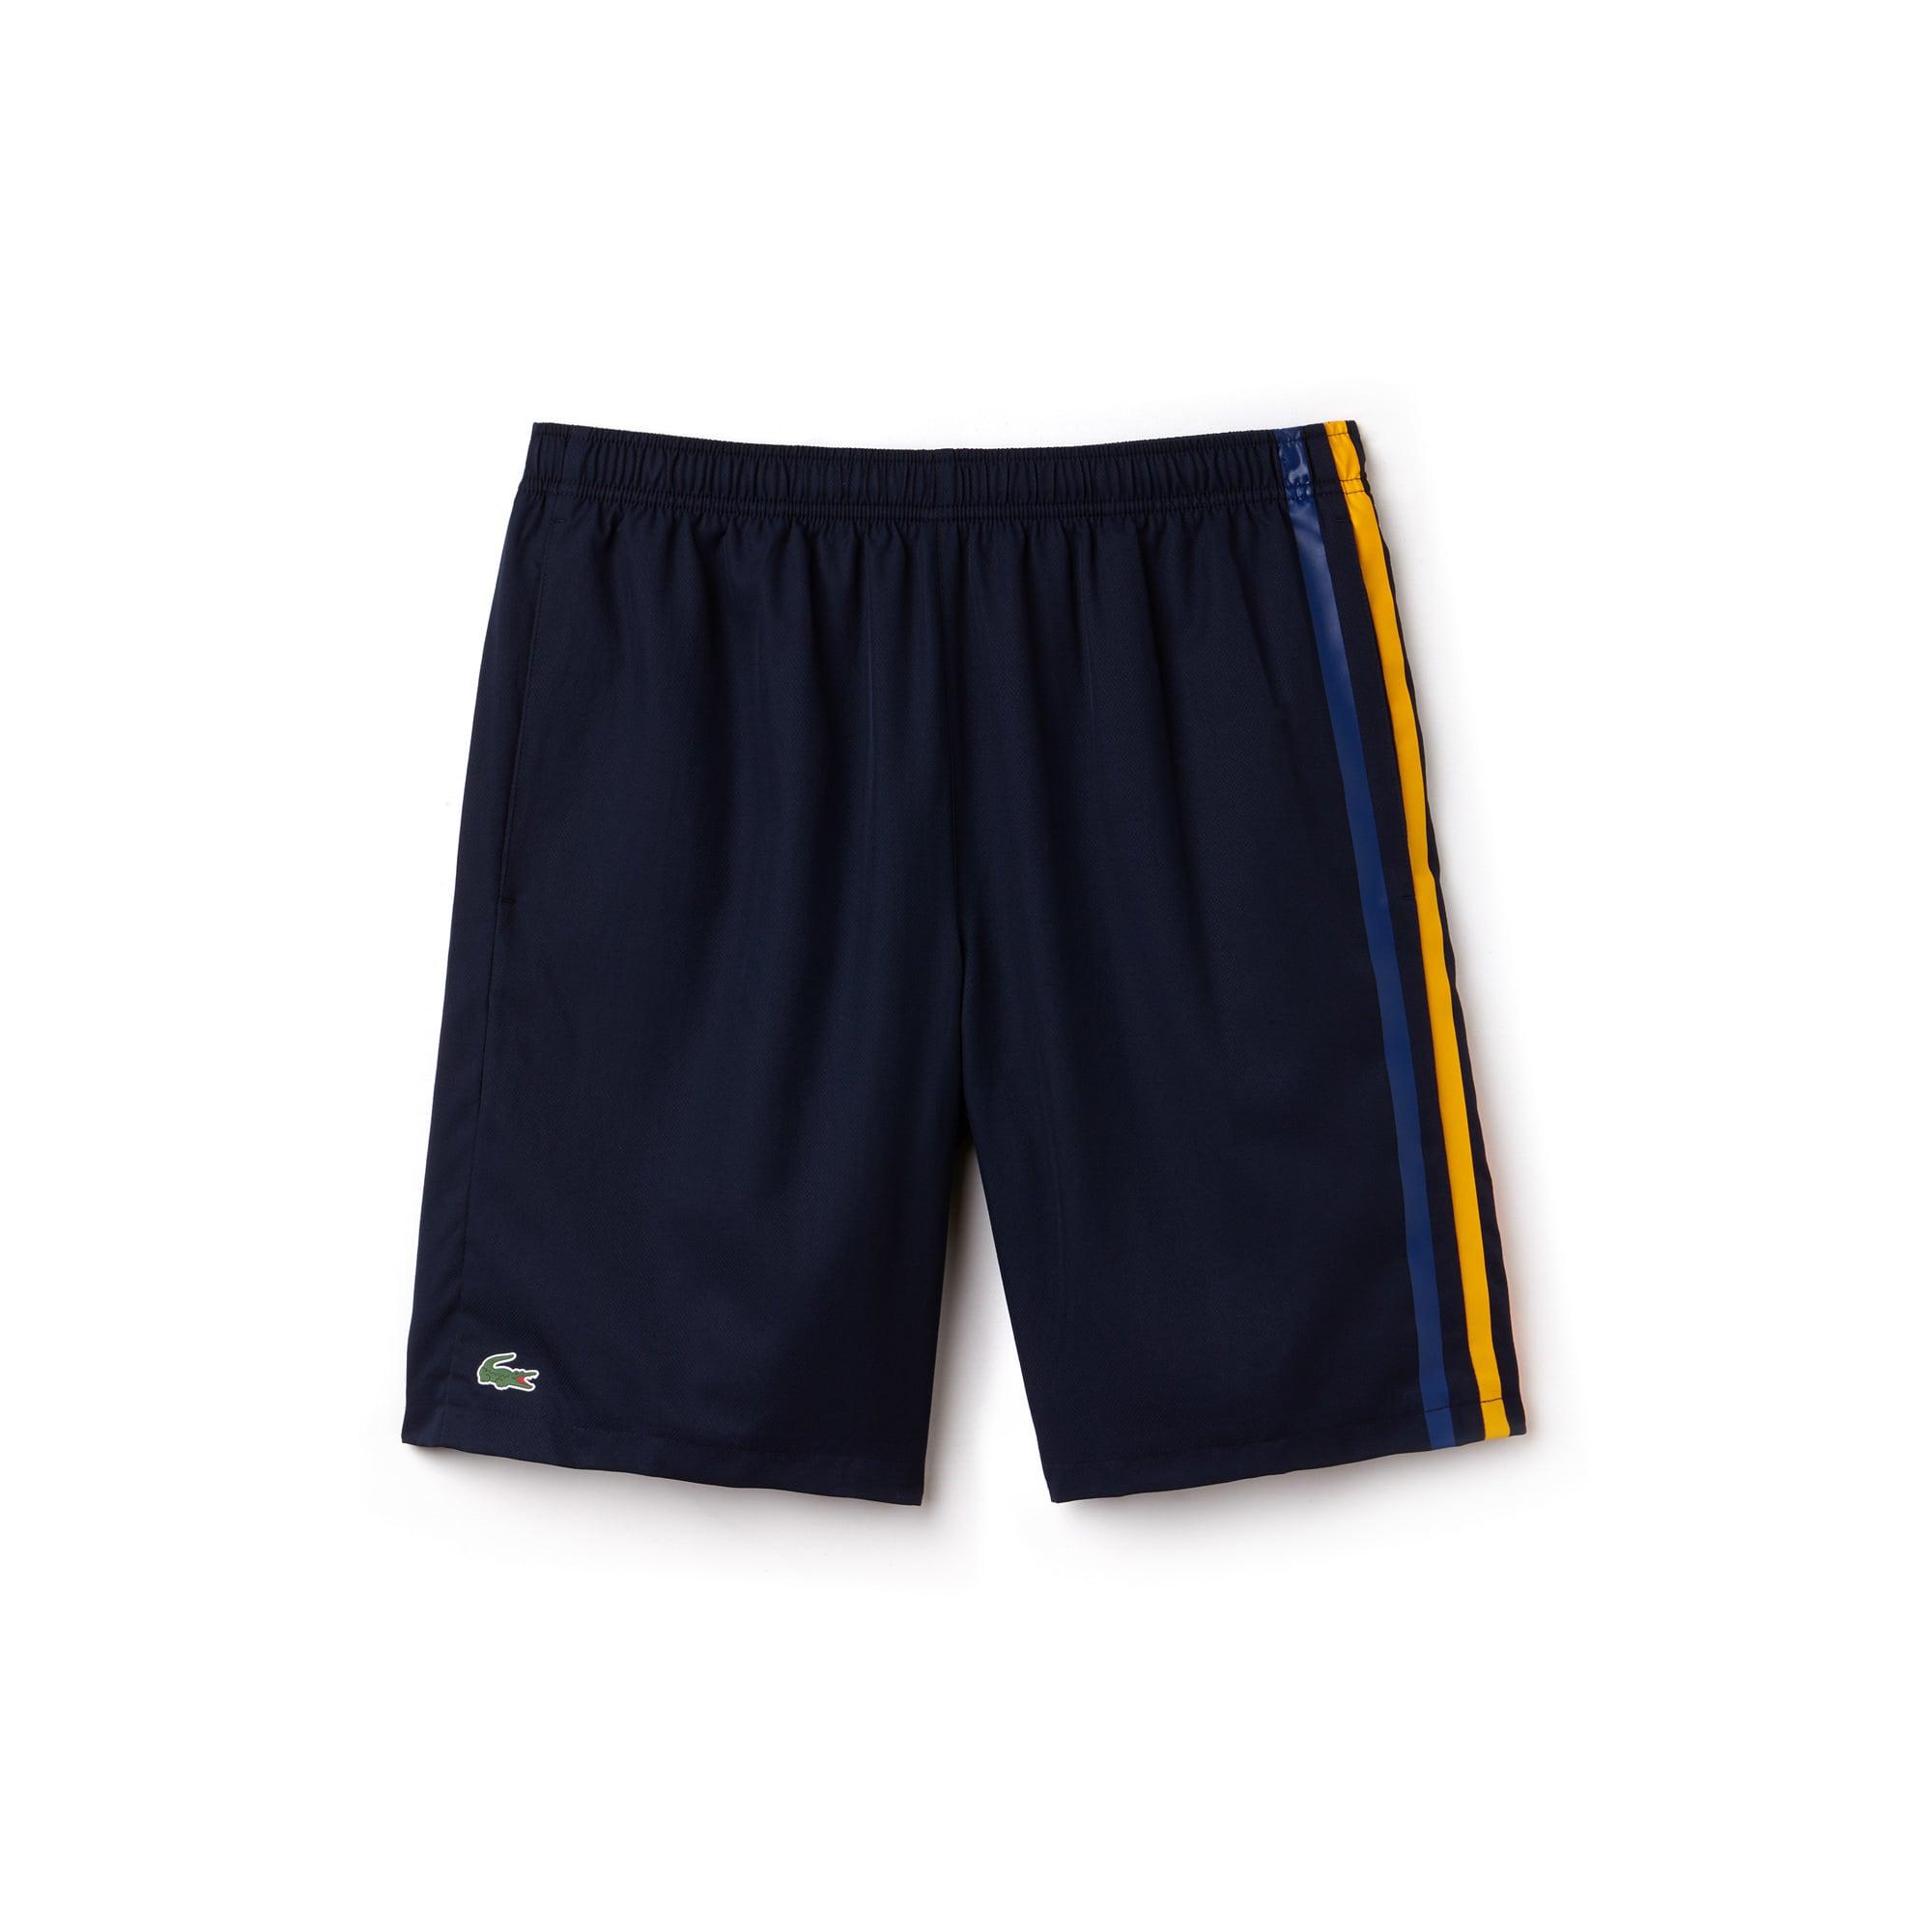 Men's Lacoste SPORT Colored Bands Taffeta Tennis Shorts